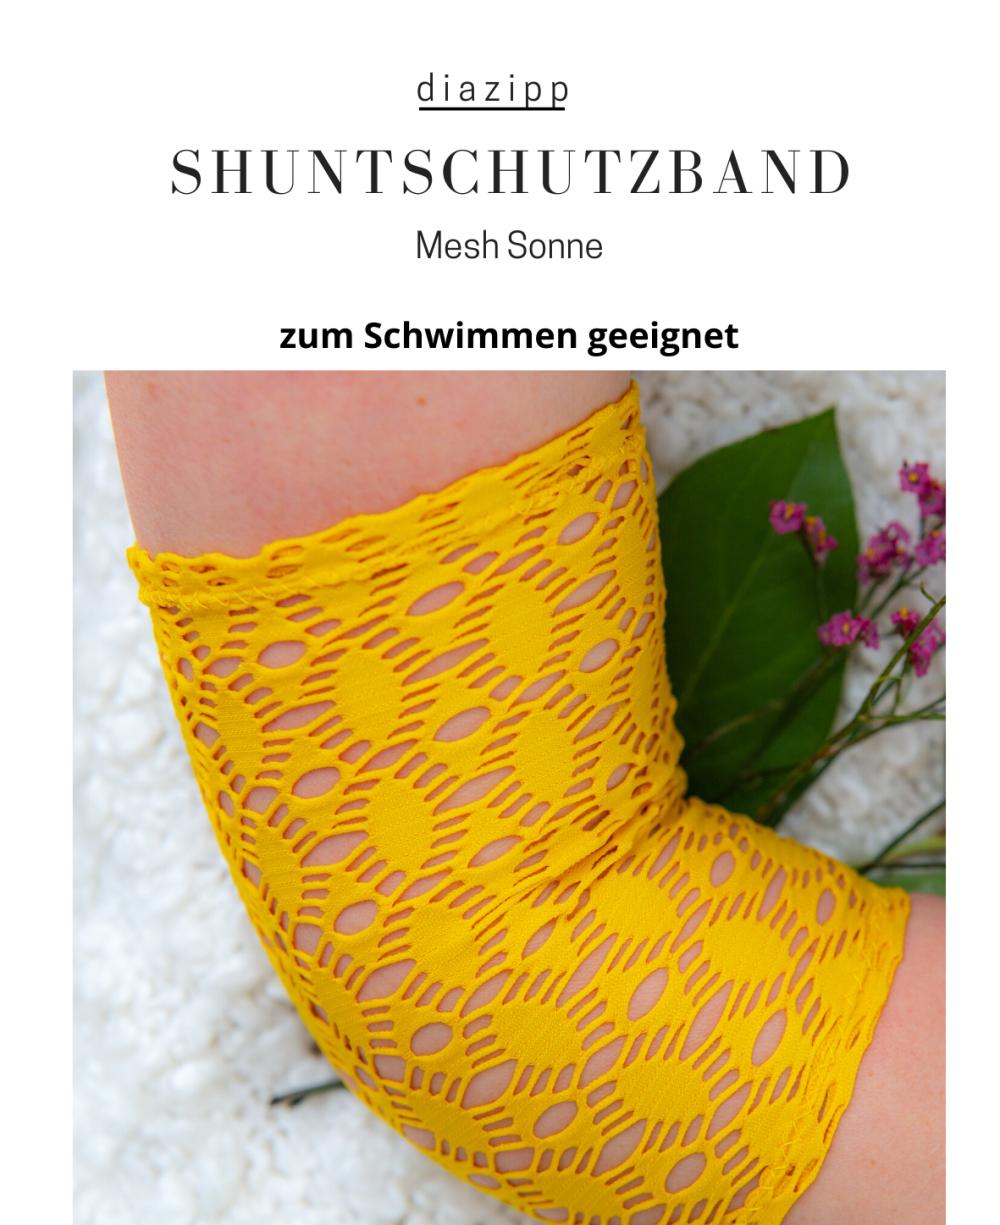 Mesh-Sonne-damen-Shuntschutzband-für-dialysepatienten-diazipp